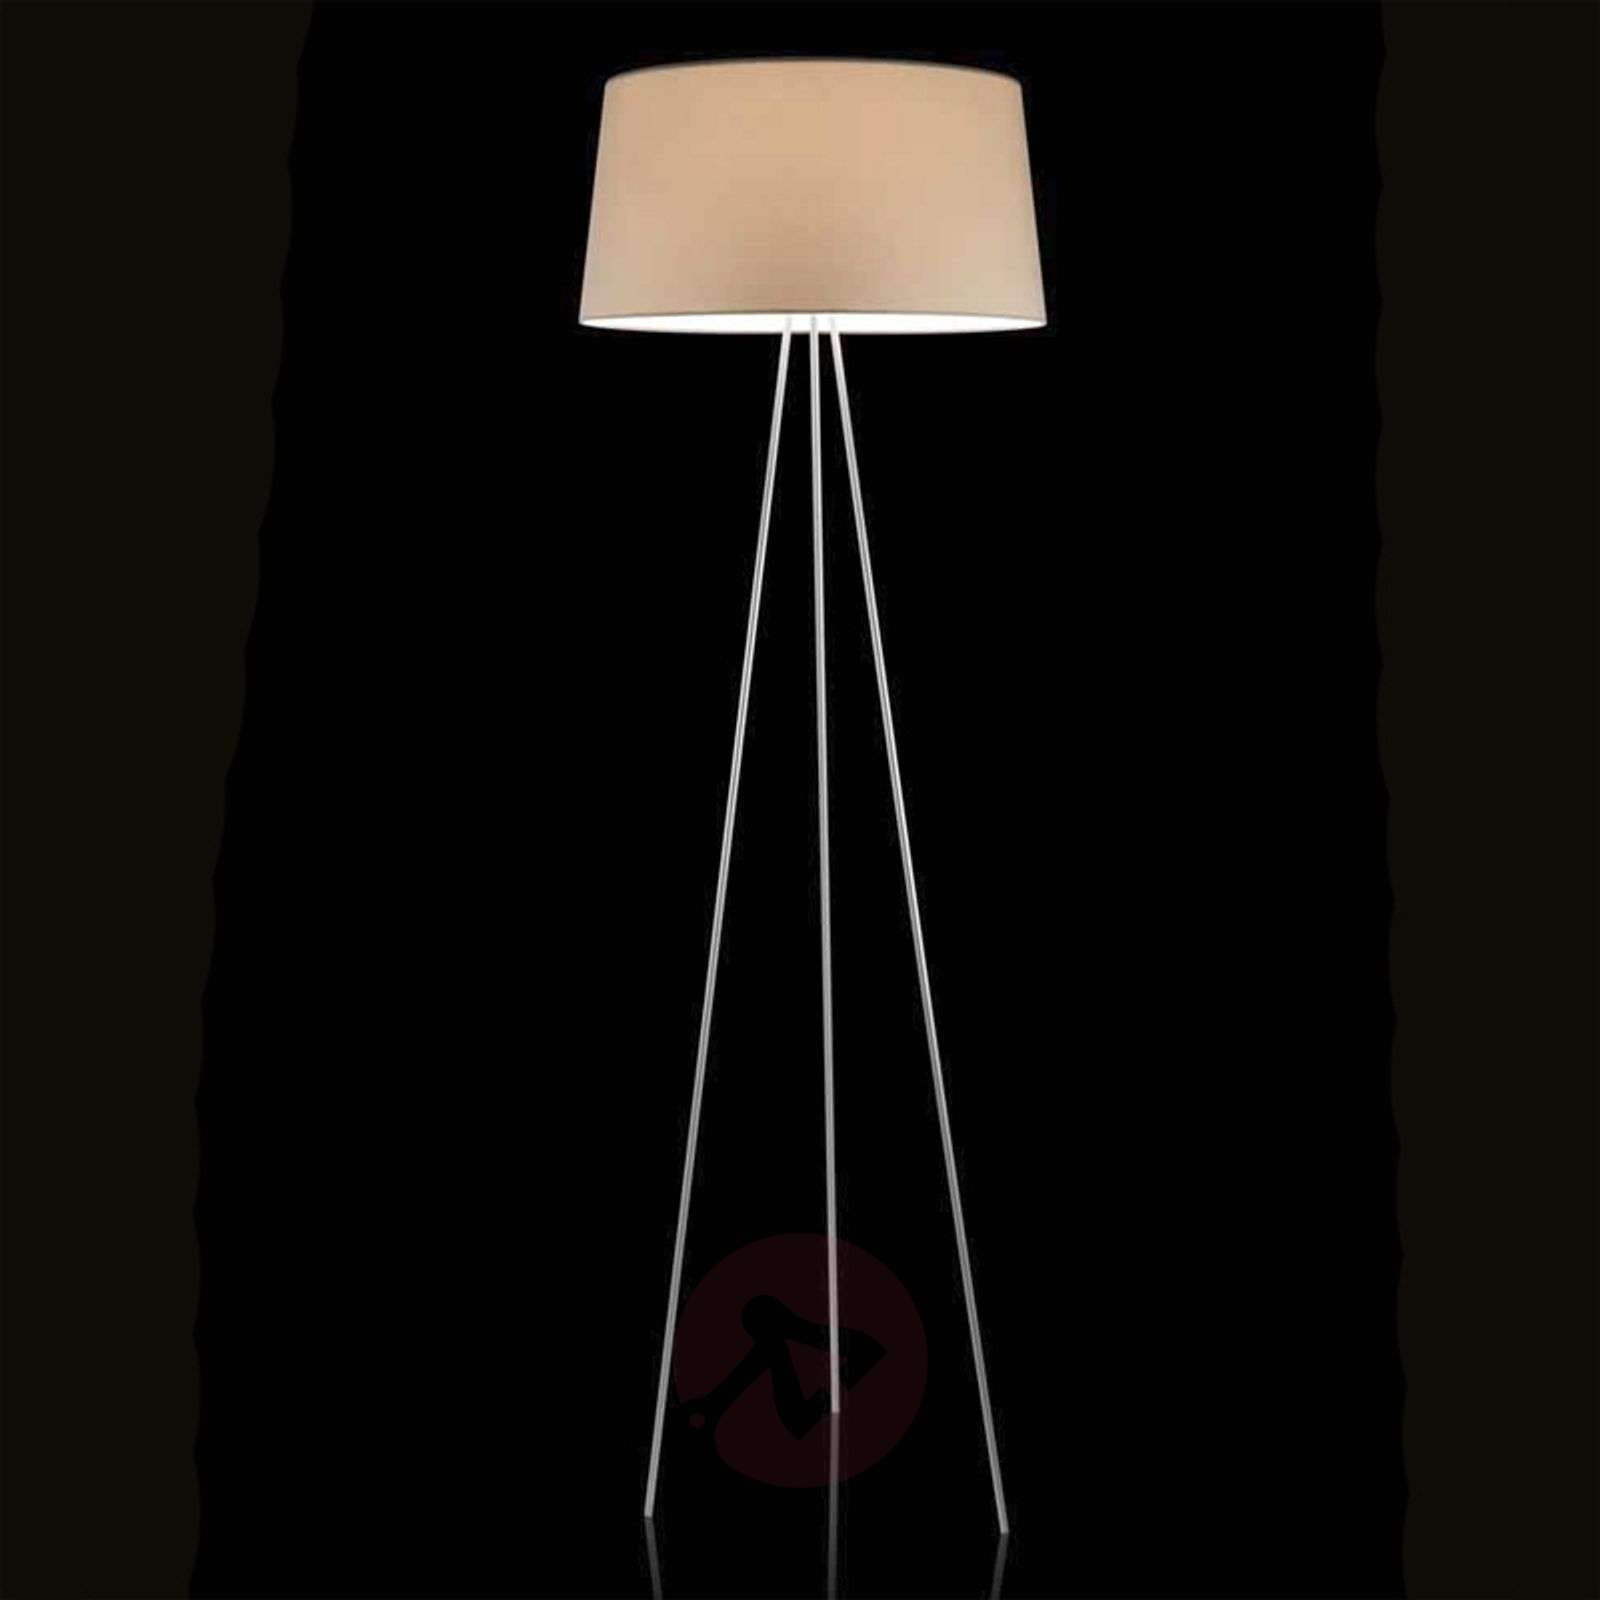 Kundalini three-legged floor lamp Tripod-5520020X-02